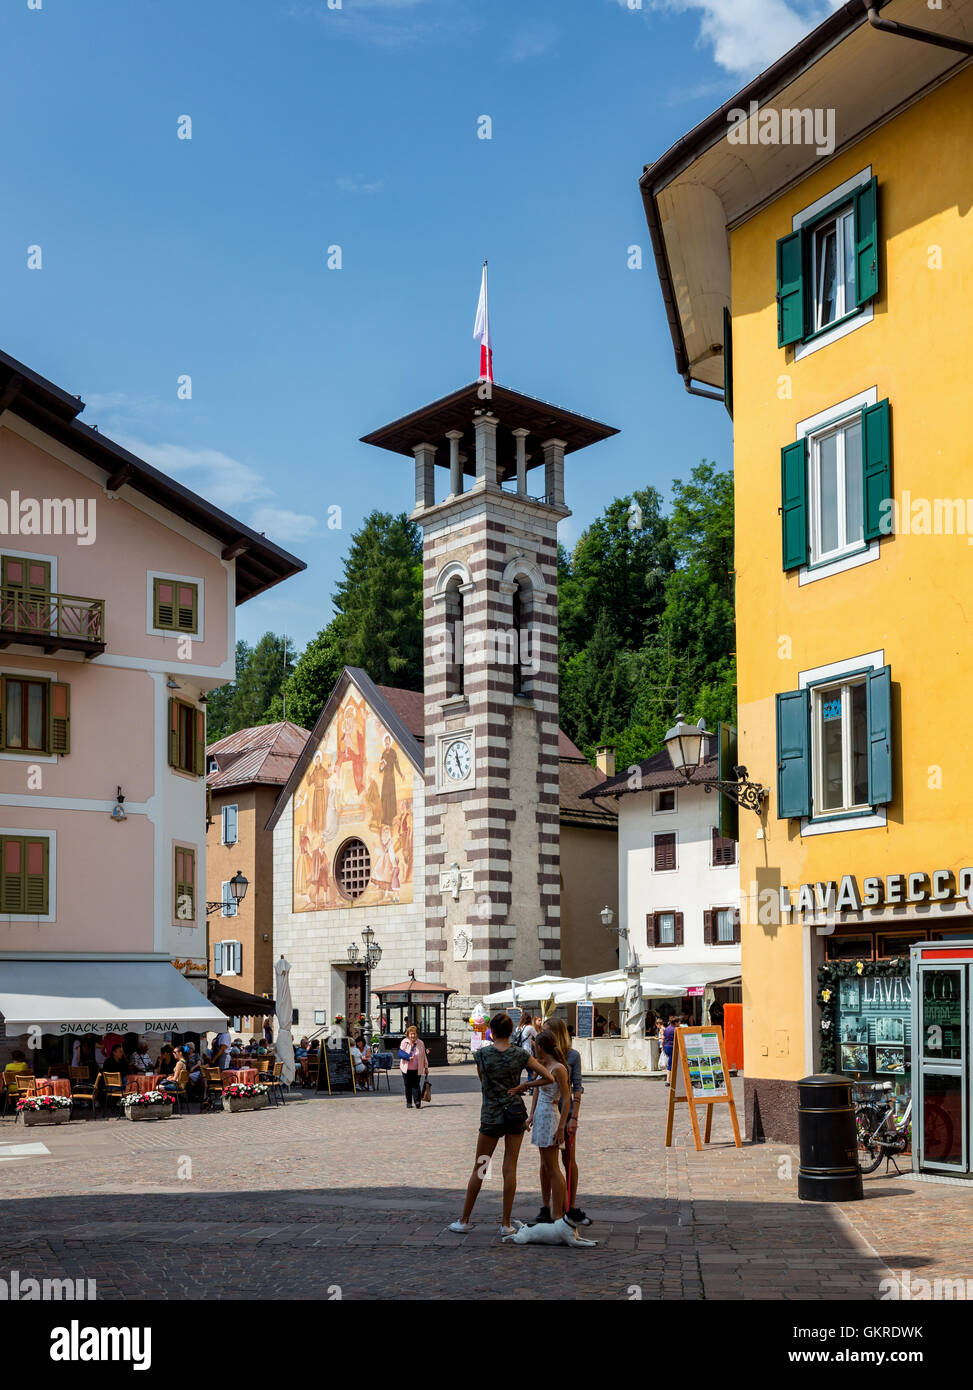 The main square in Tonadico, Trentino,  Trentino-Alto Adige/Südtirol, Italy - Stock Image